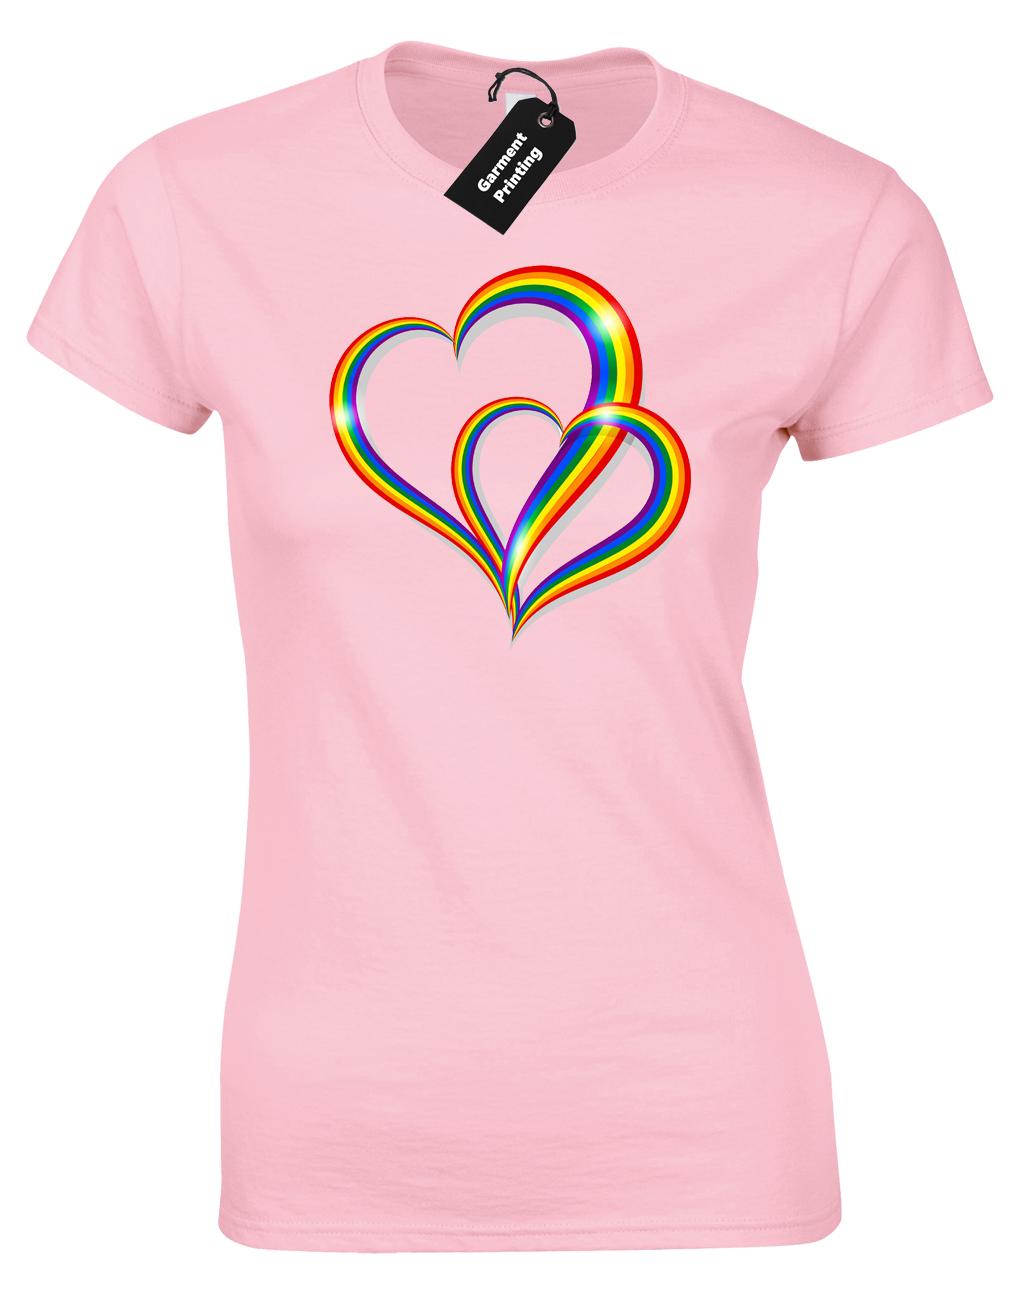 2 Pride Hearts Ladies T-Shirt Gay Lesbian Lgbt Unisex Rainbow Womens Top ( Col) 11